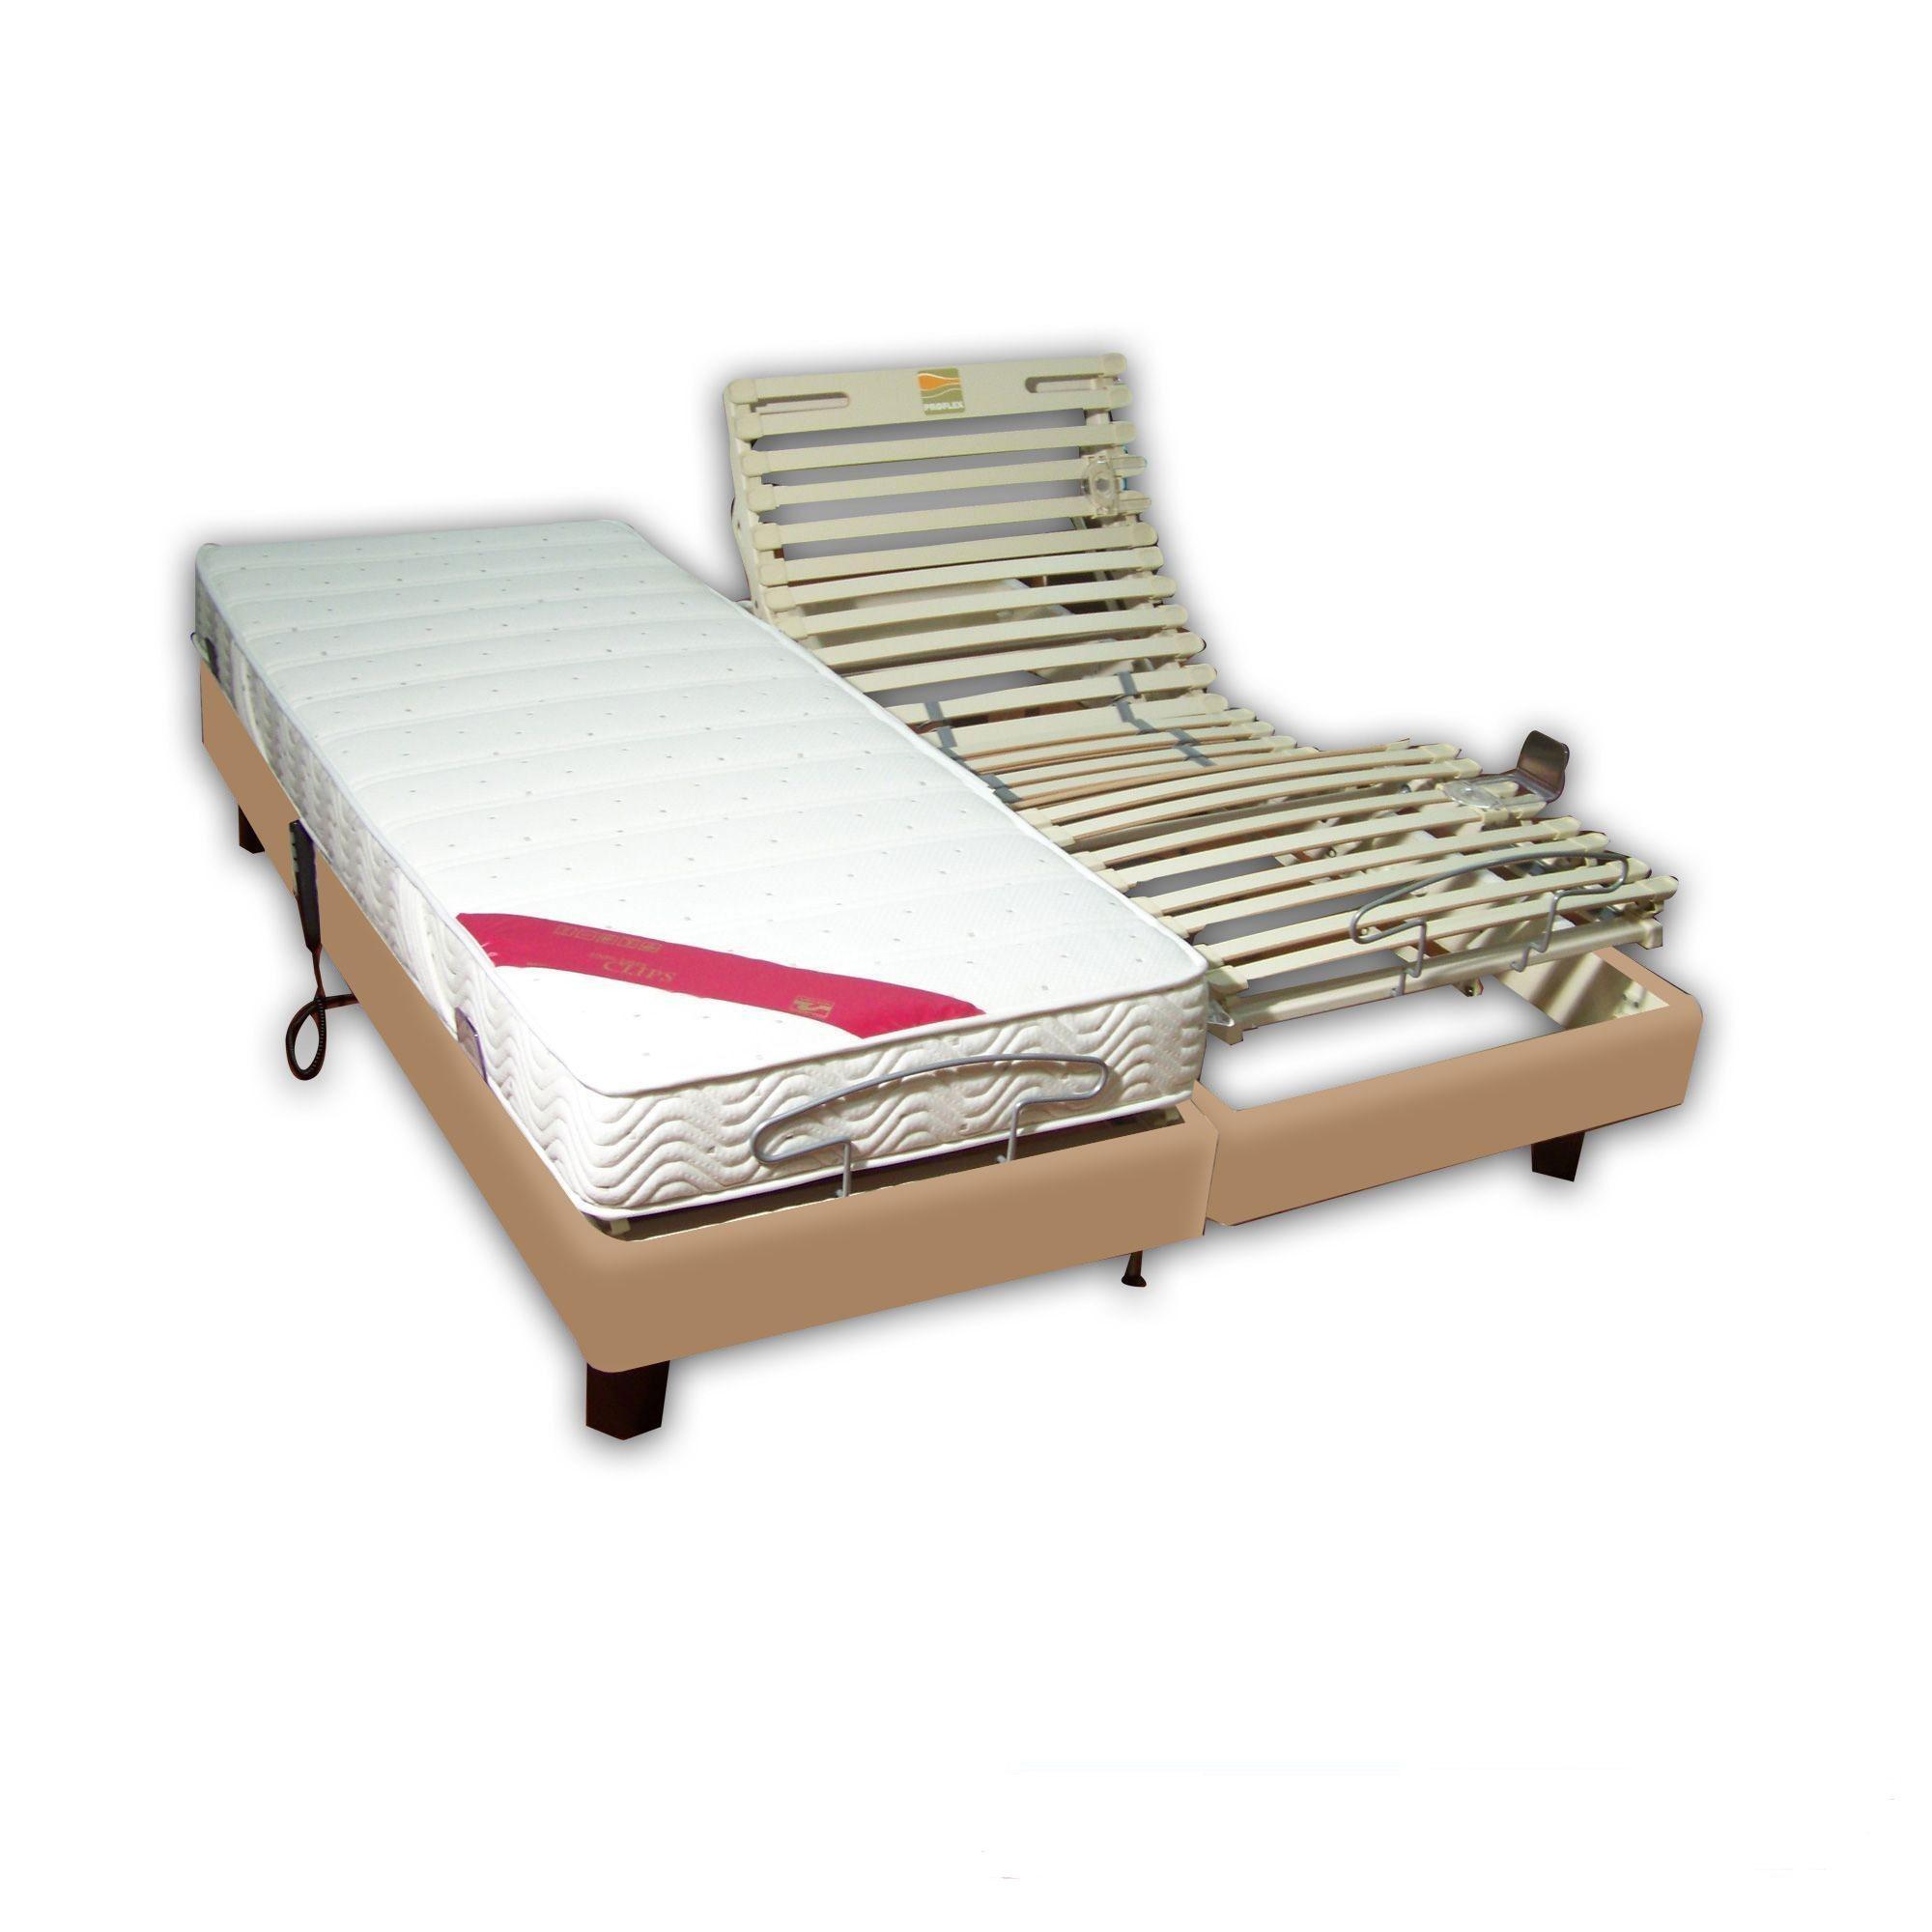 achat ensemble relaxation latex 2x80x200 clips simili cuir beige pas cher avenue literie. Black Bedroom Furniture Sets. Home Design Ideas